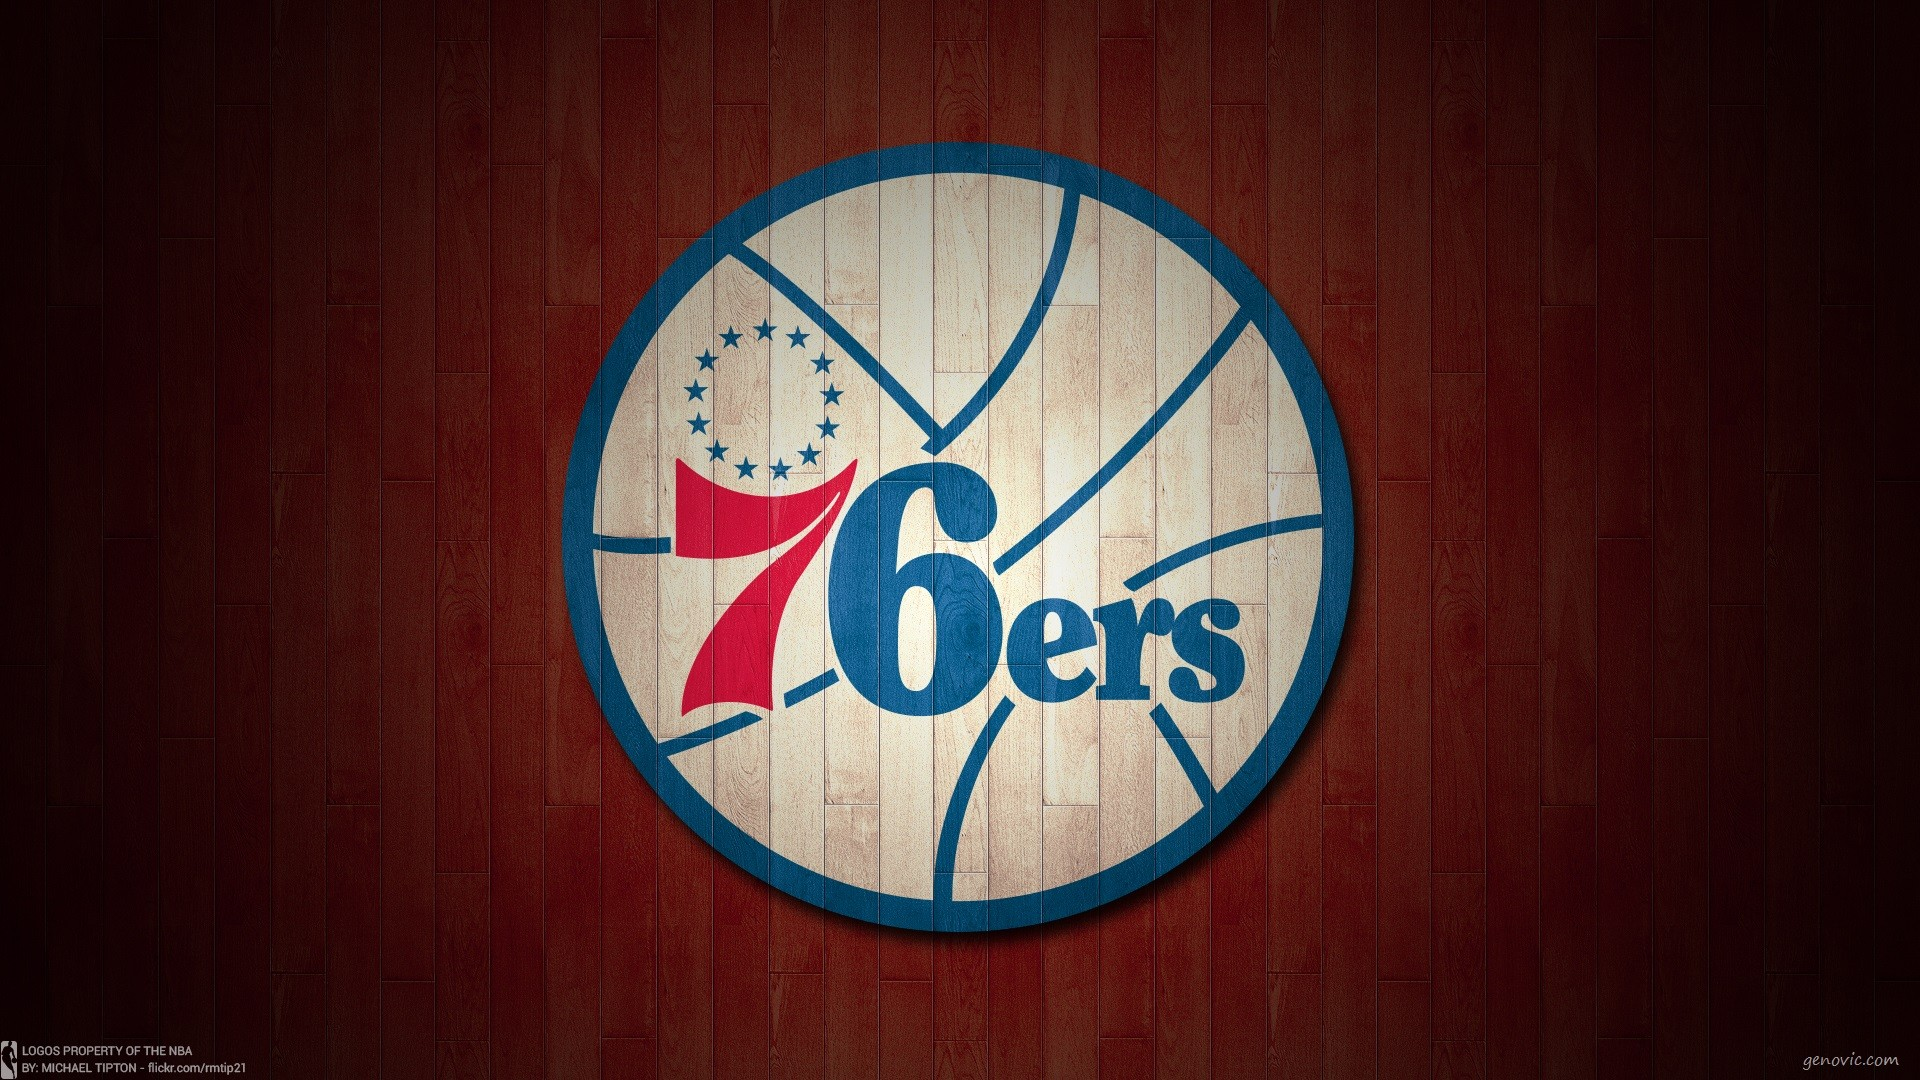 76ers Logo HD Wallpaper